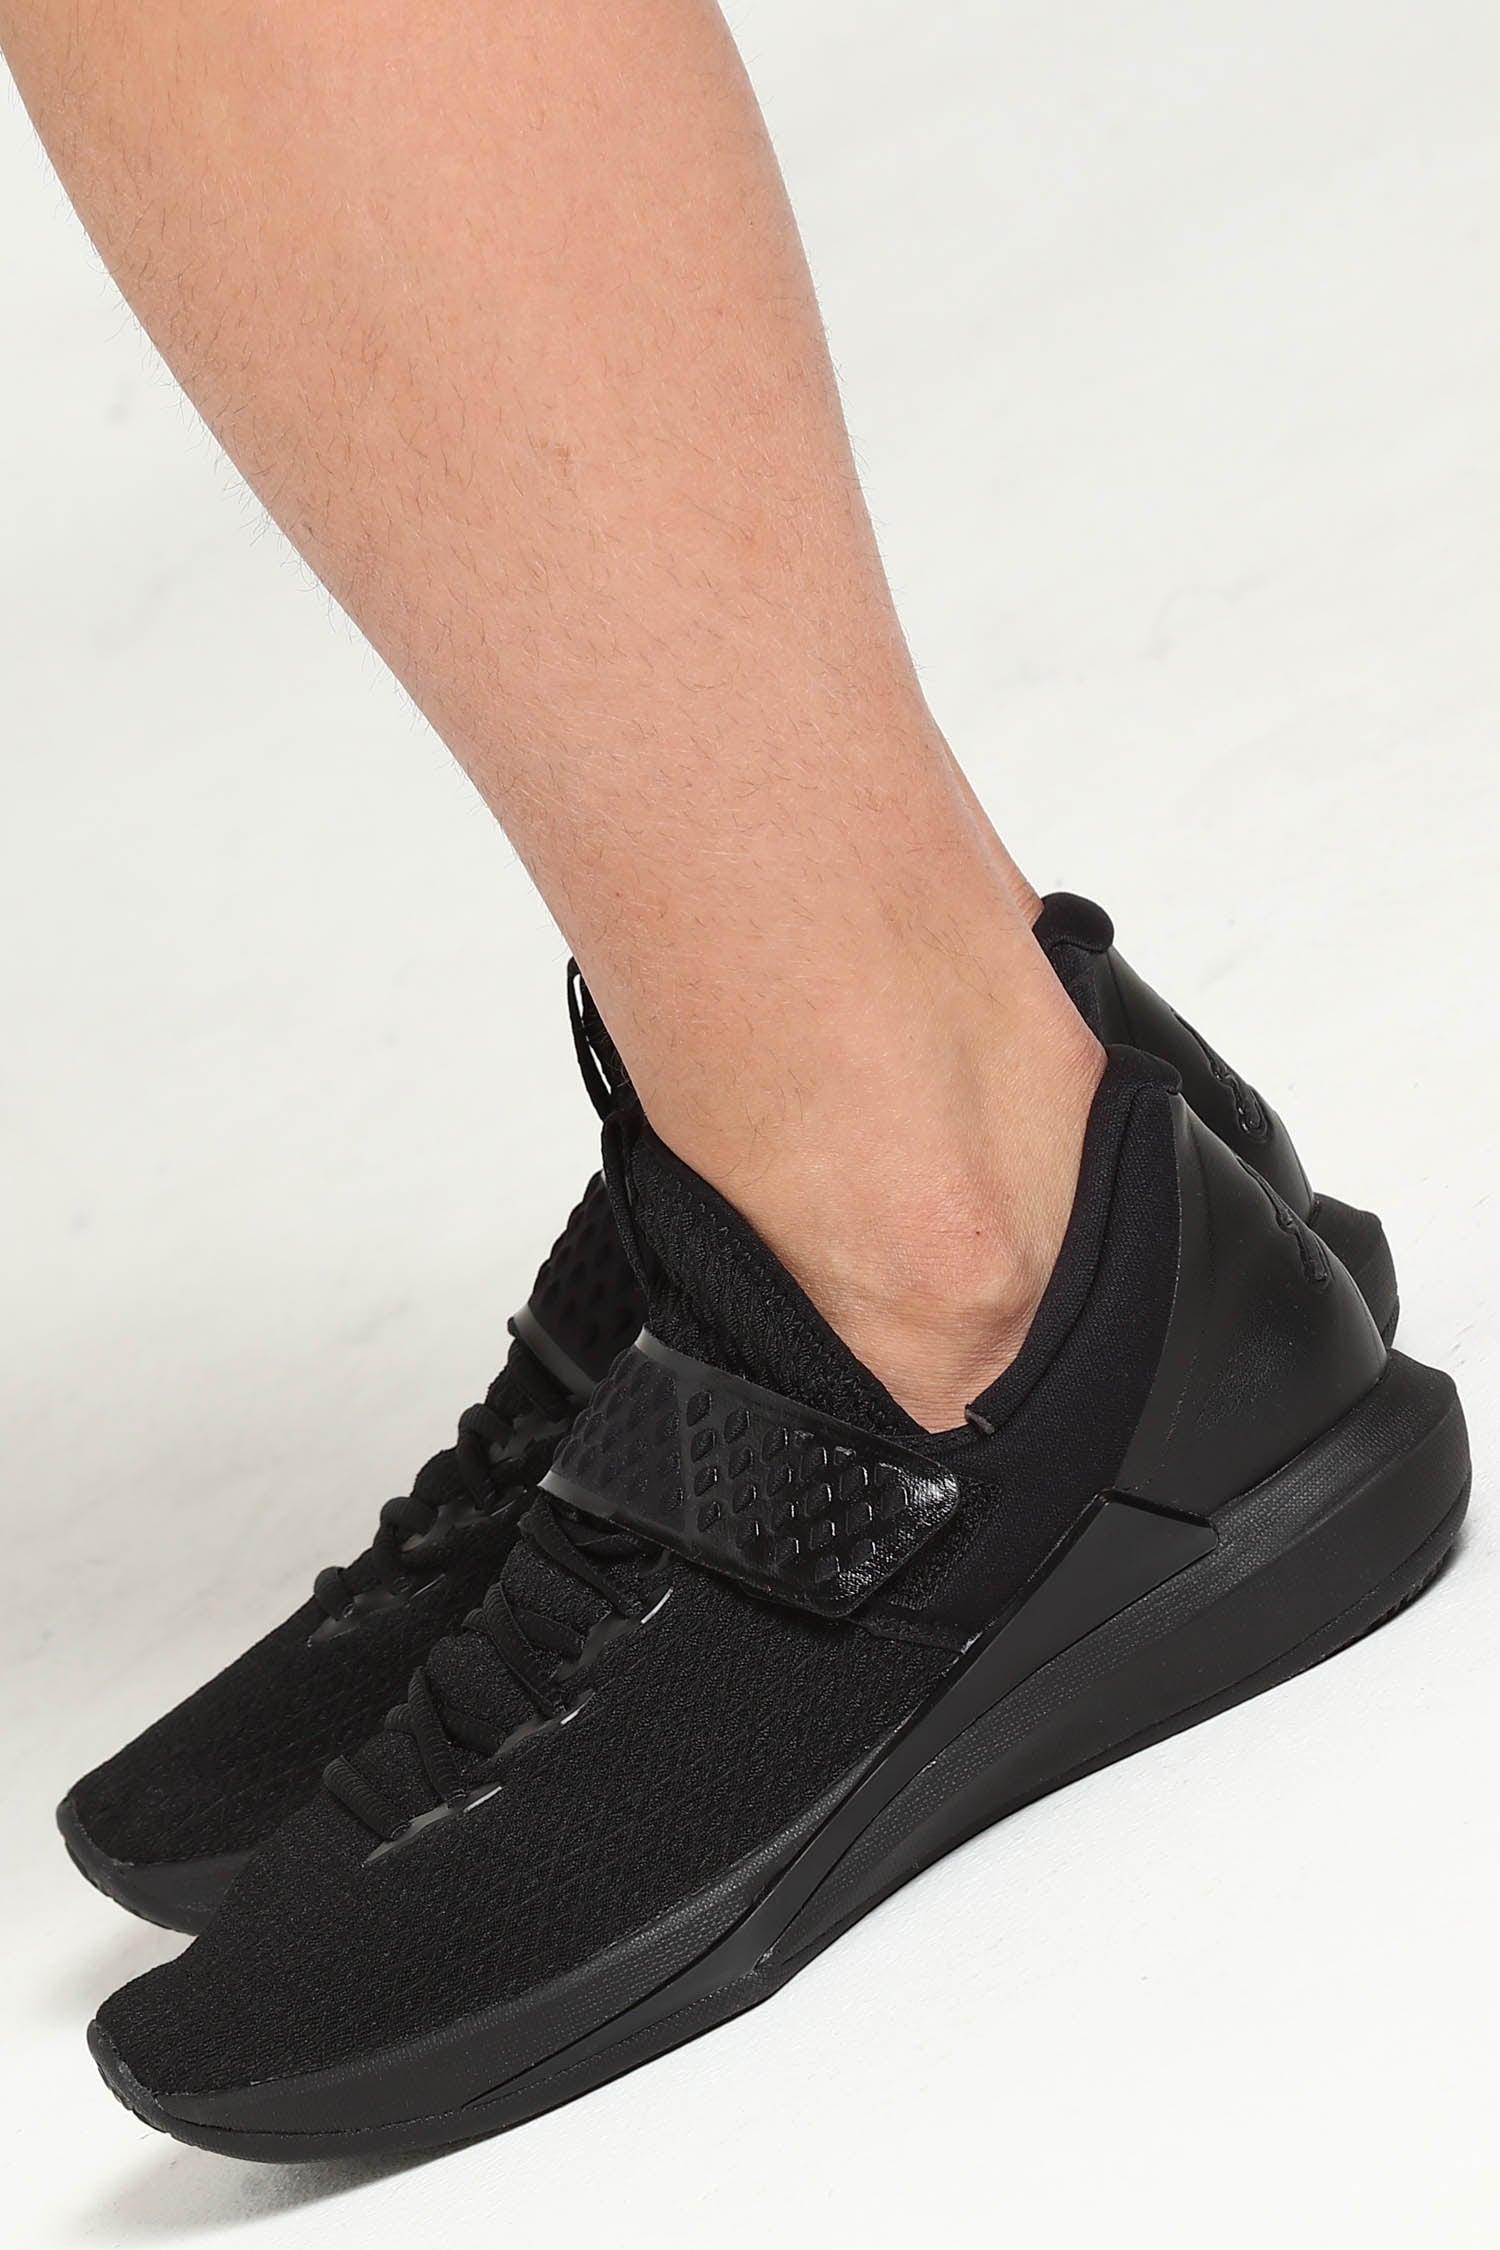 Jordan Trainer 3 Black/Black/Black